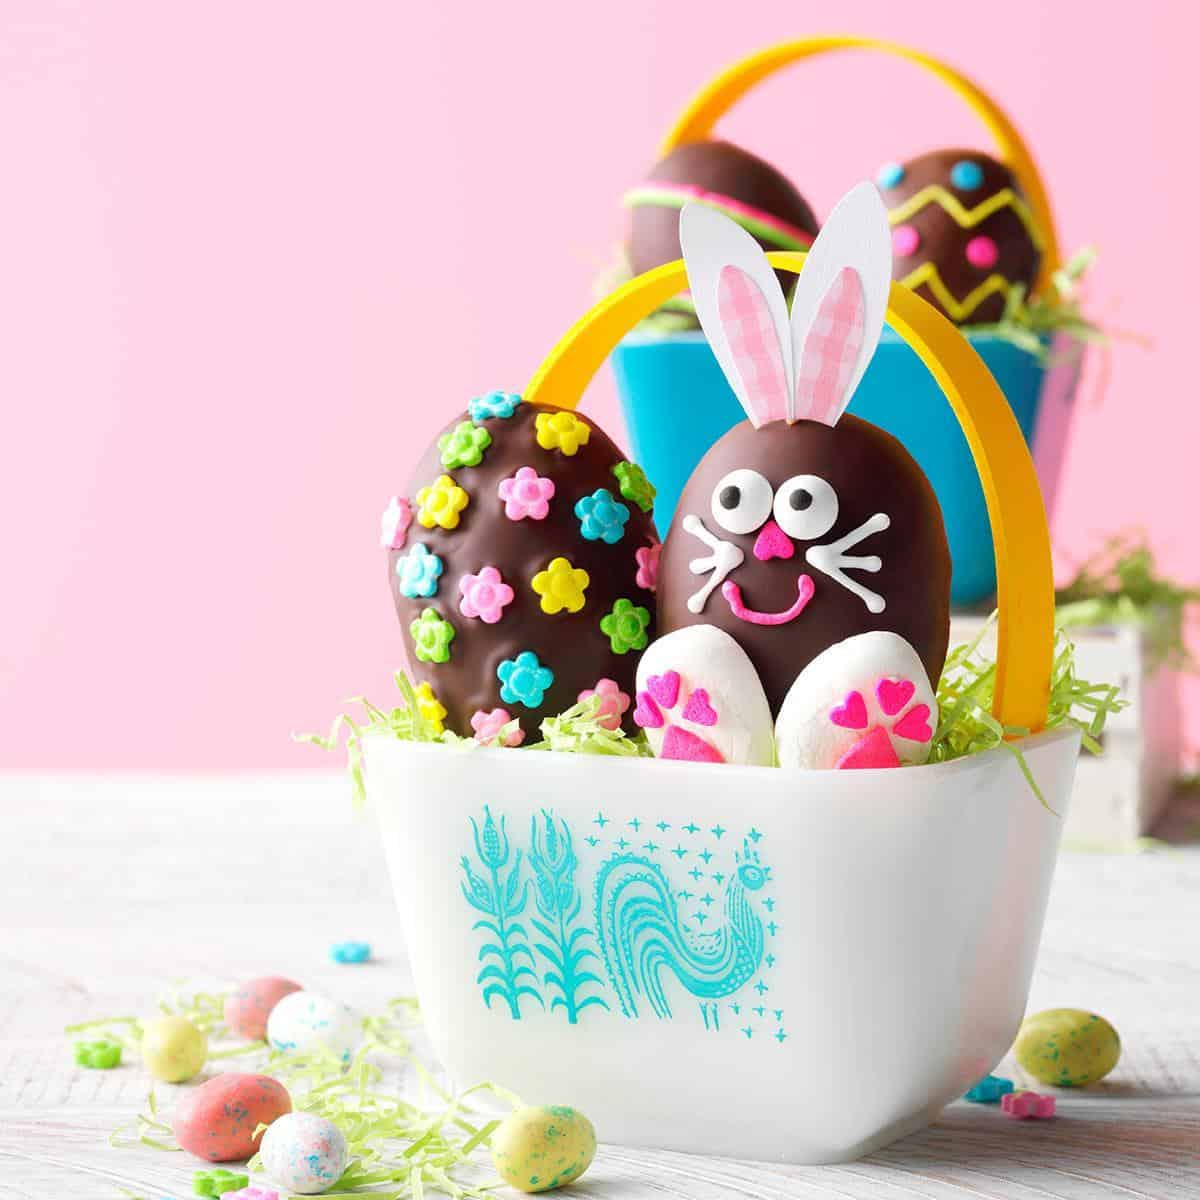 Peanut Butter Easter Eggs_EXPS_CWFM19_42493_E01_09_1b